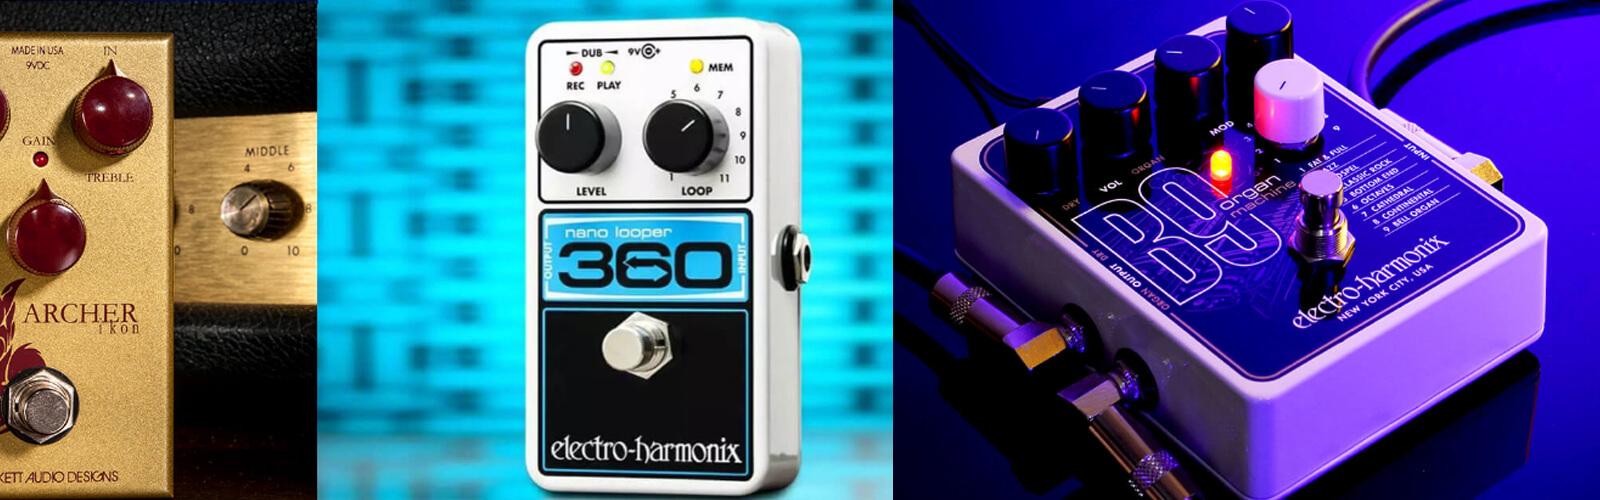 Electro-Harmonix foot pedals